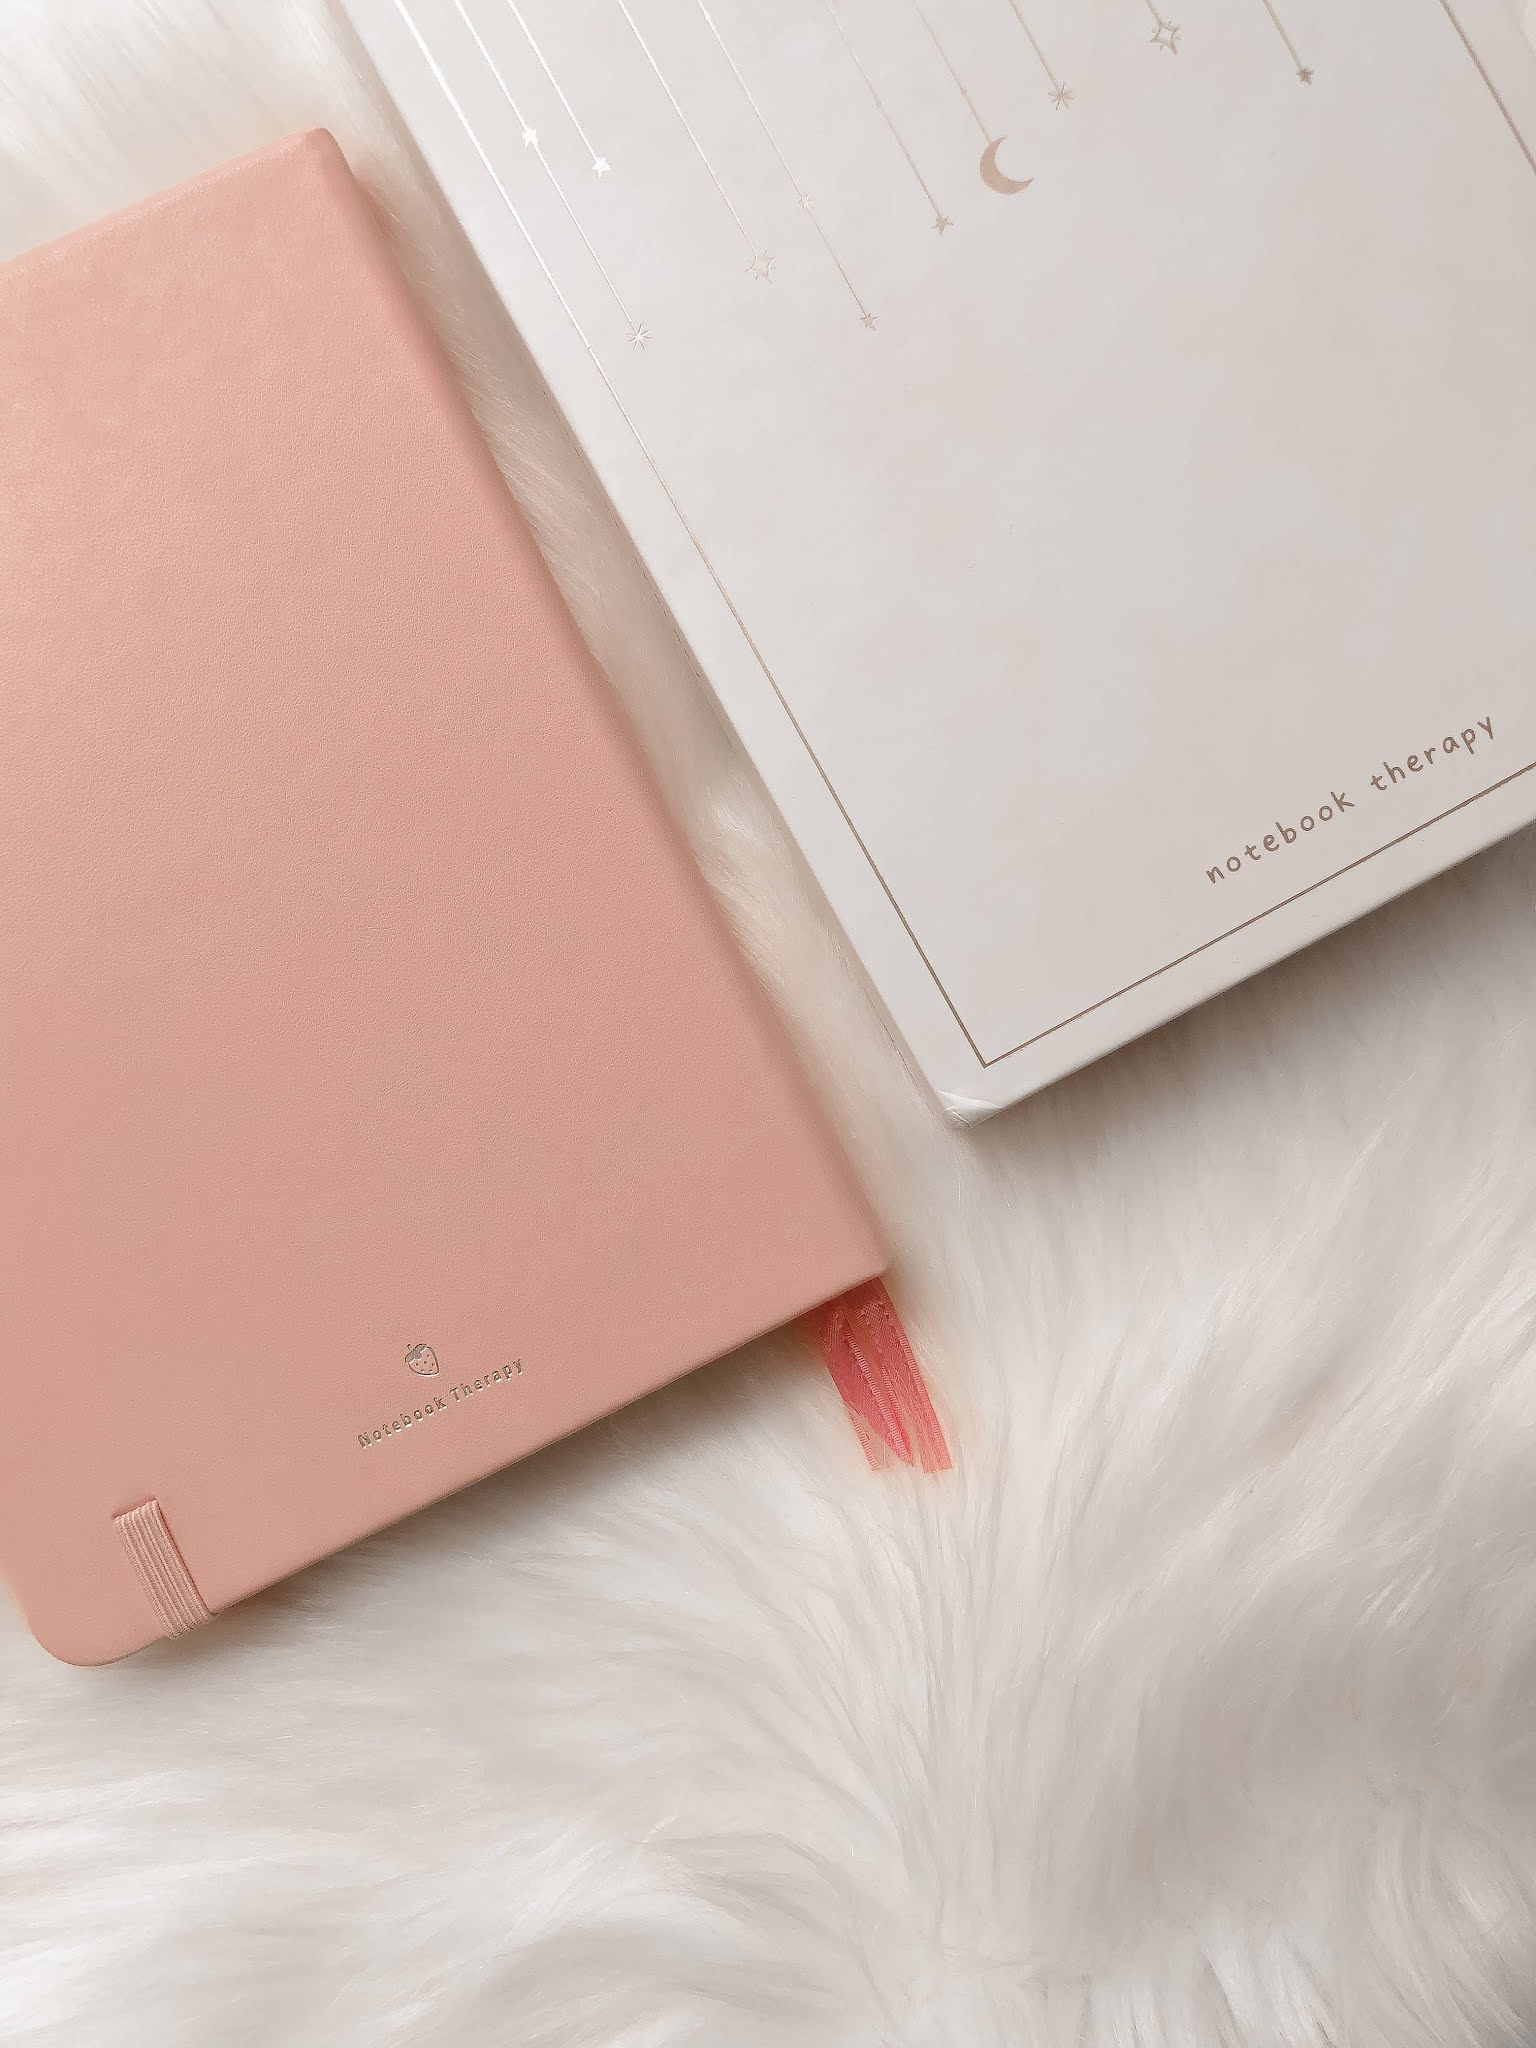 Notebook Therapy The Tsuki 'Ichigo' Limited Edition Boba Bullet Journal